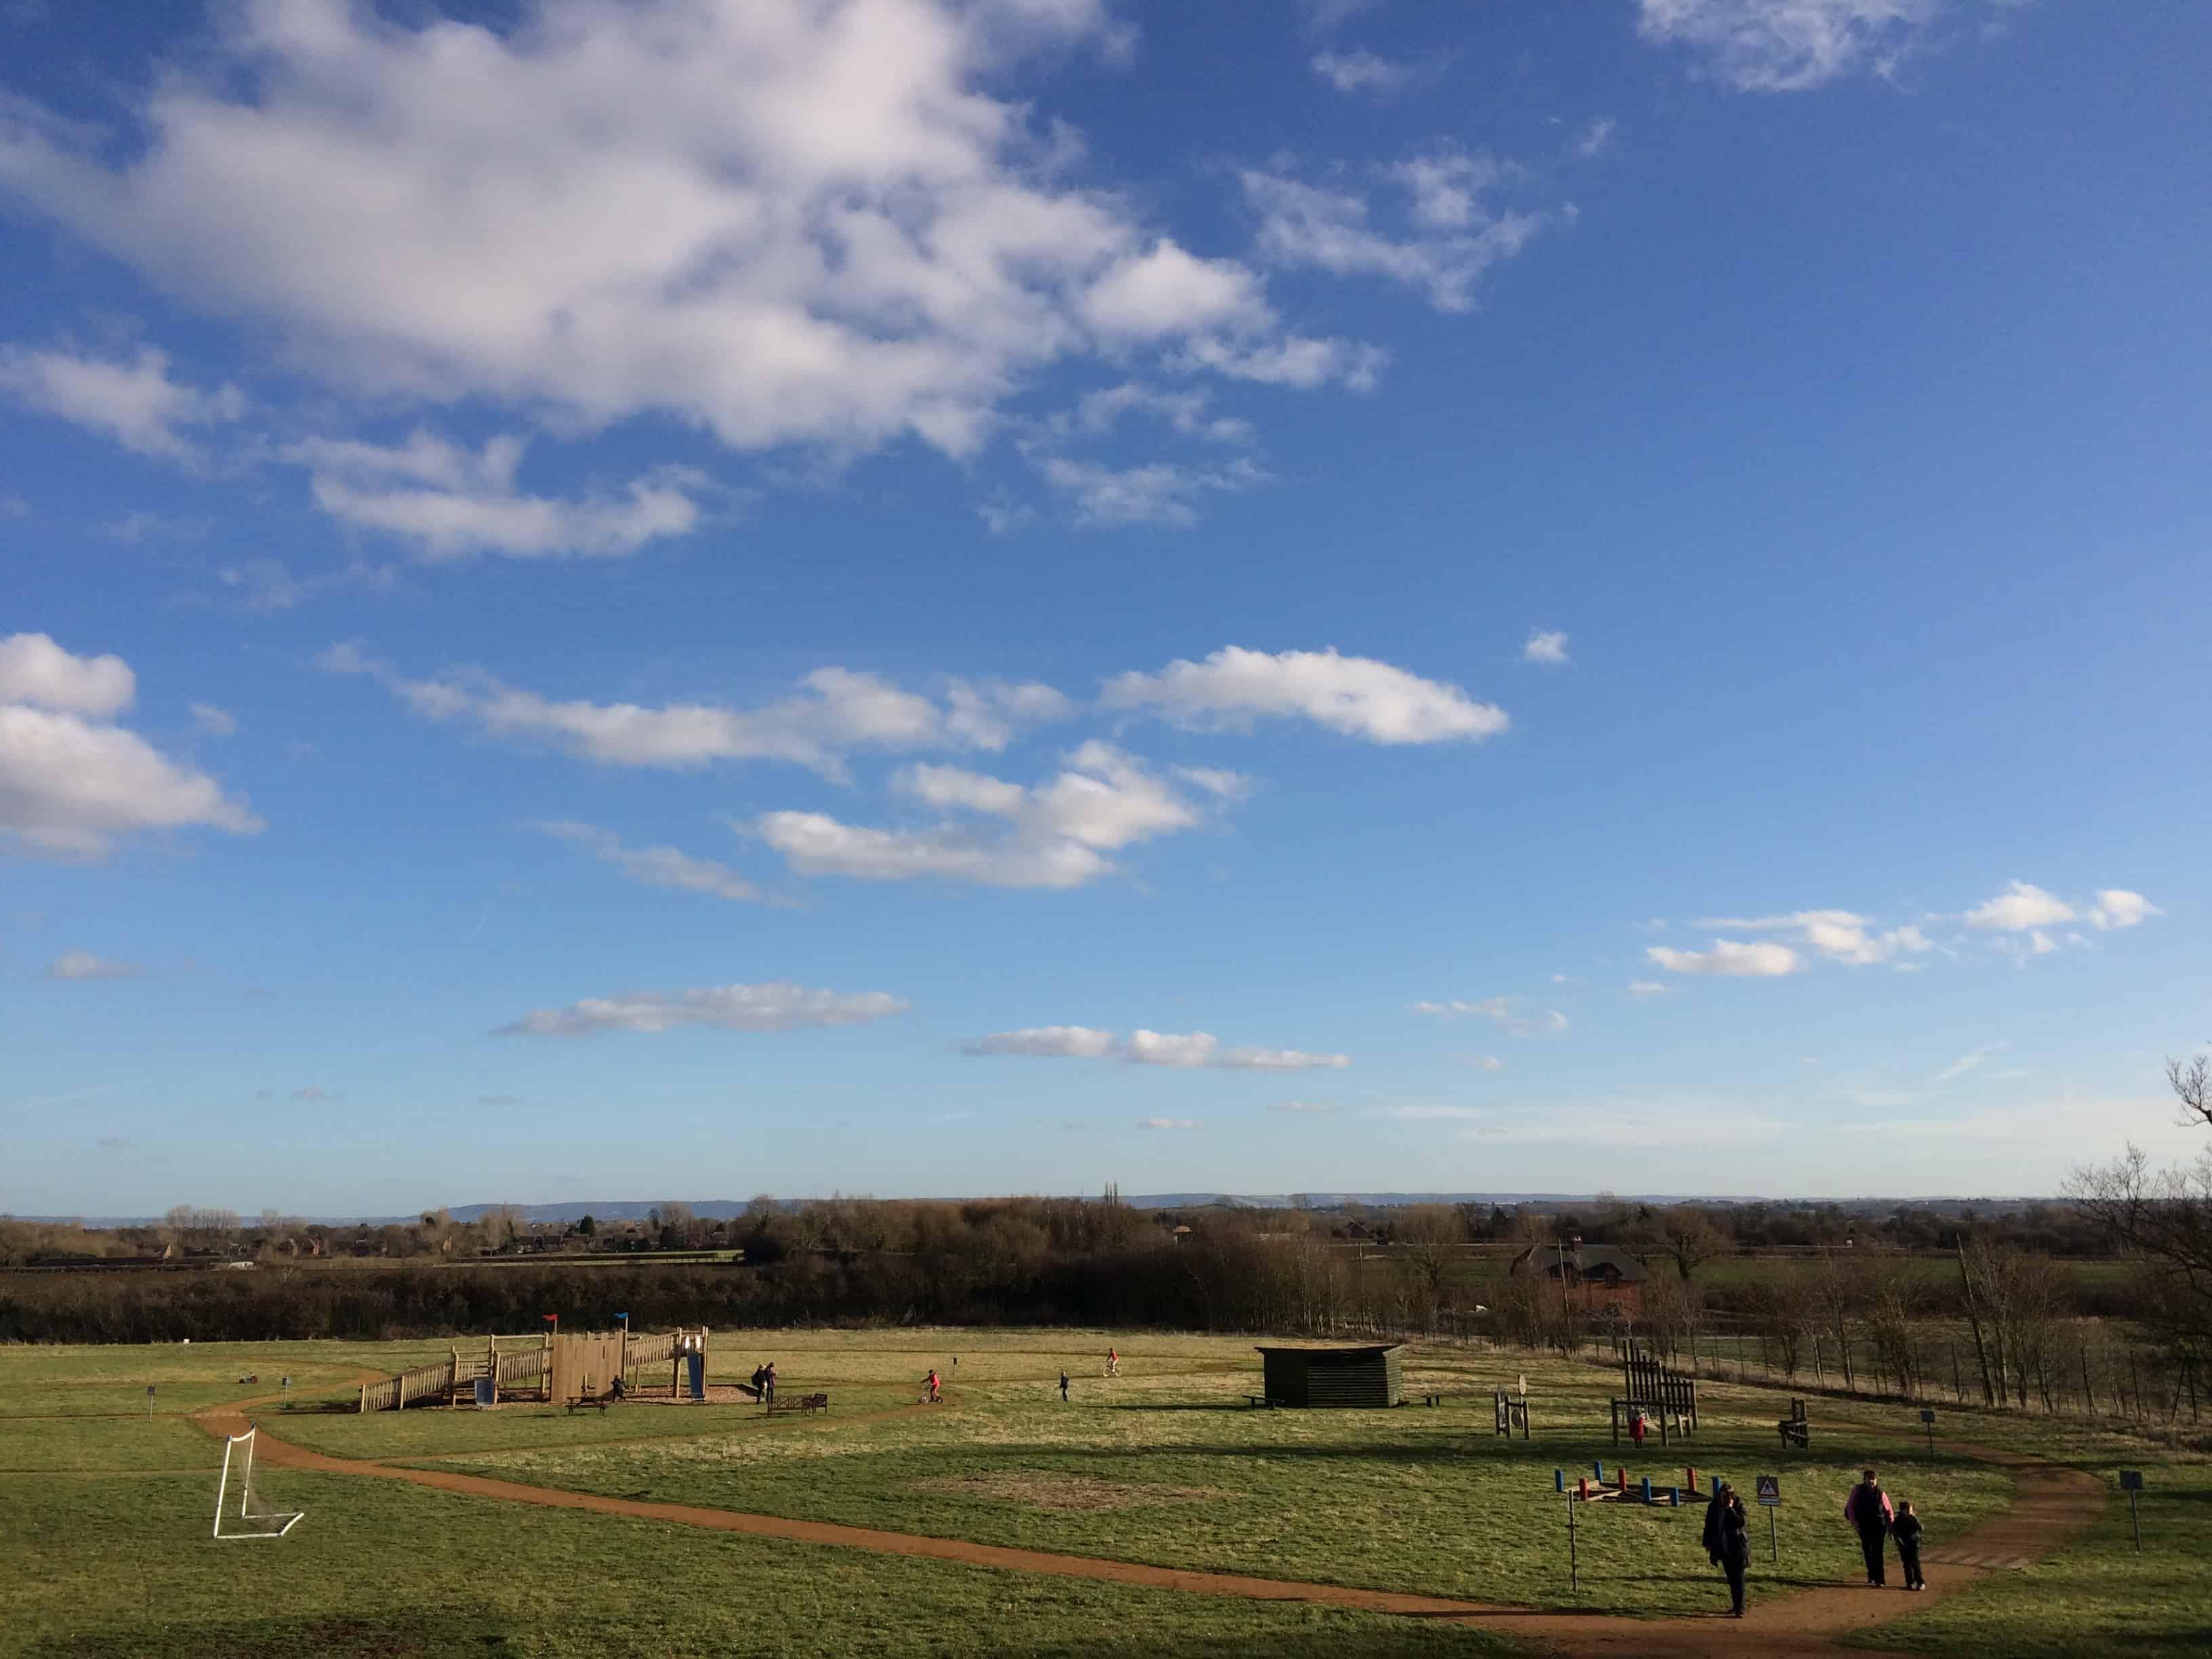 Thomley Field